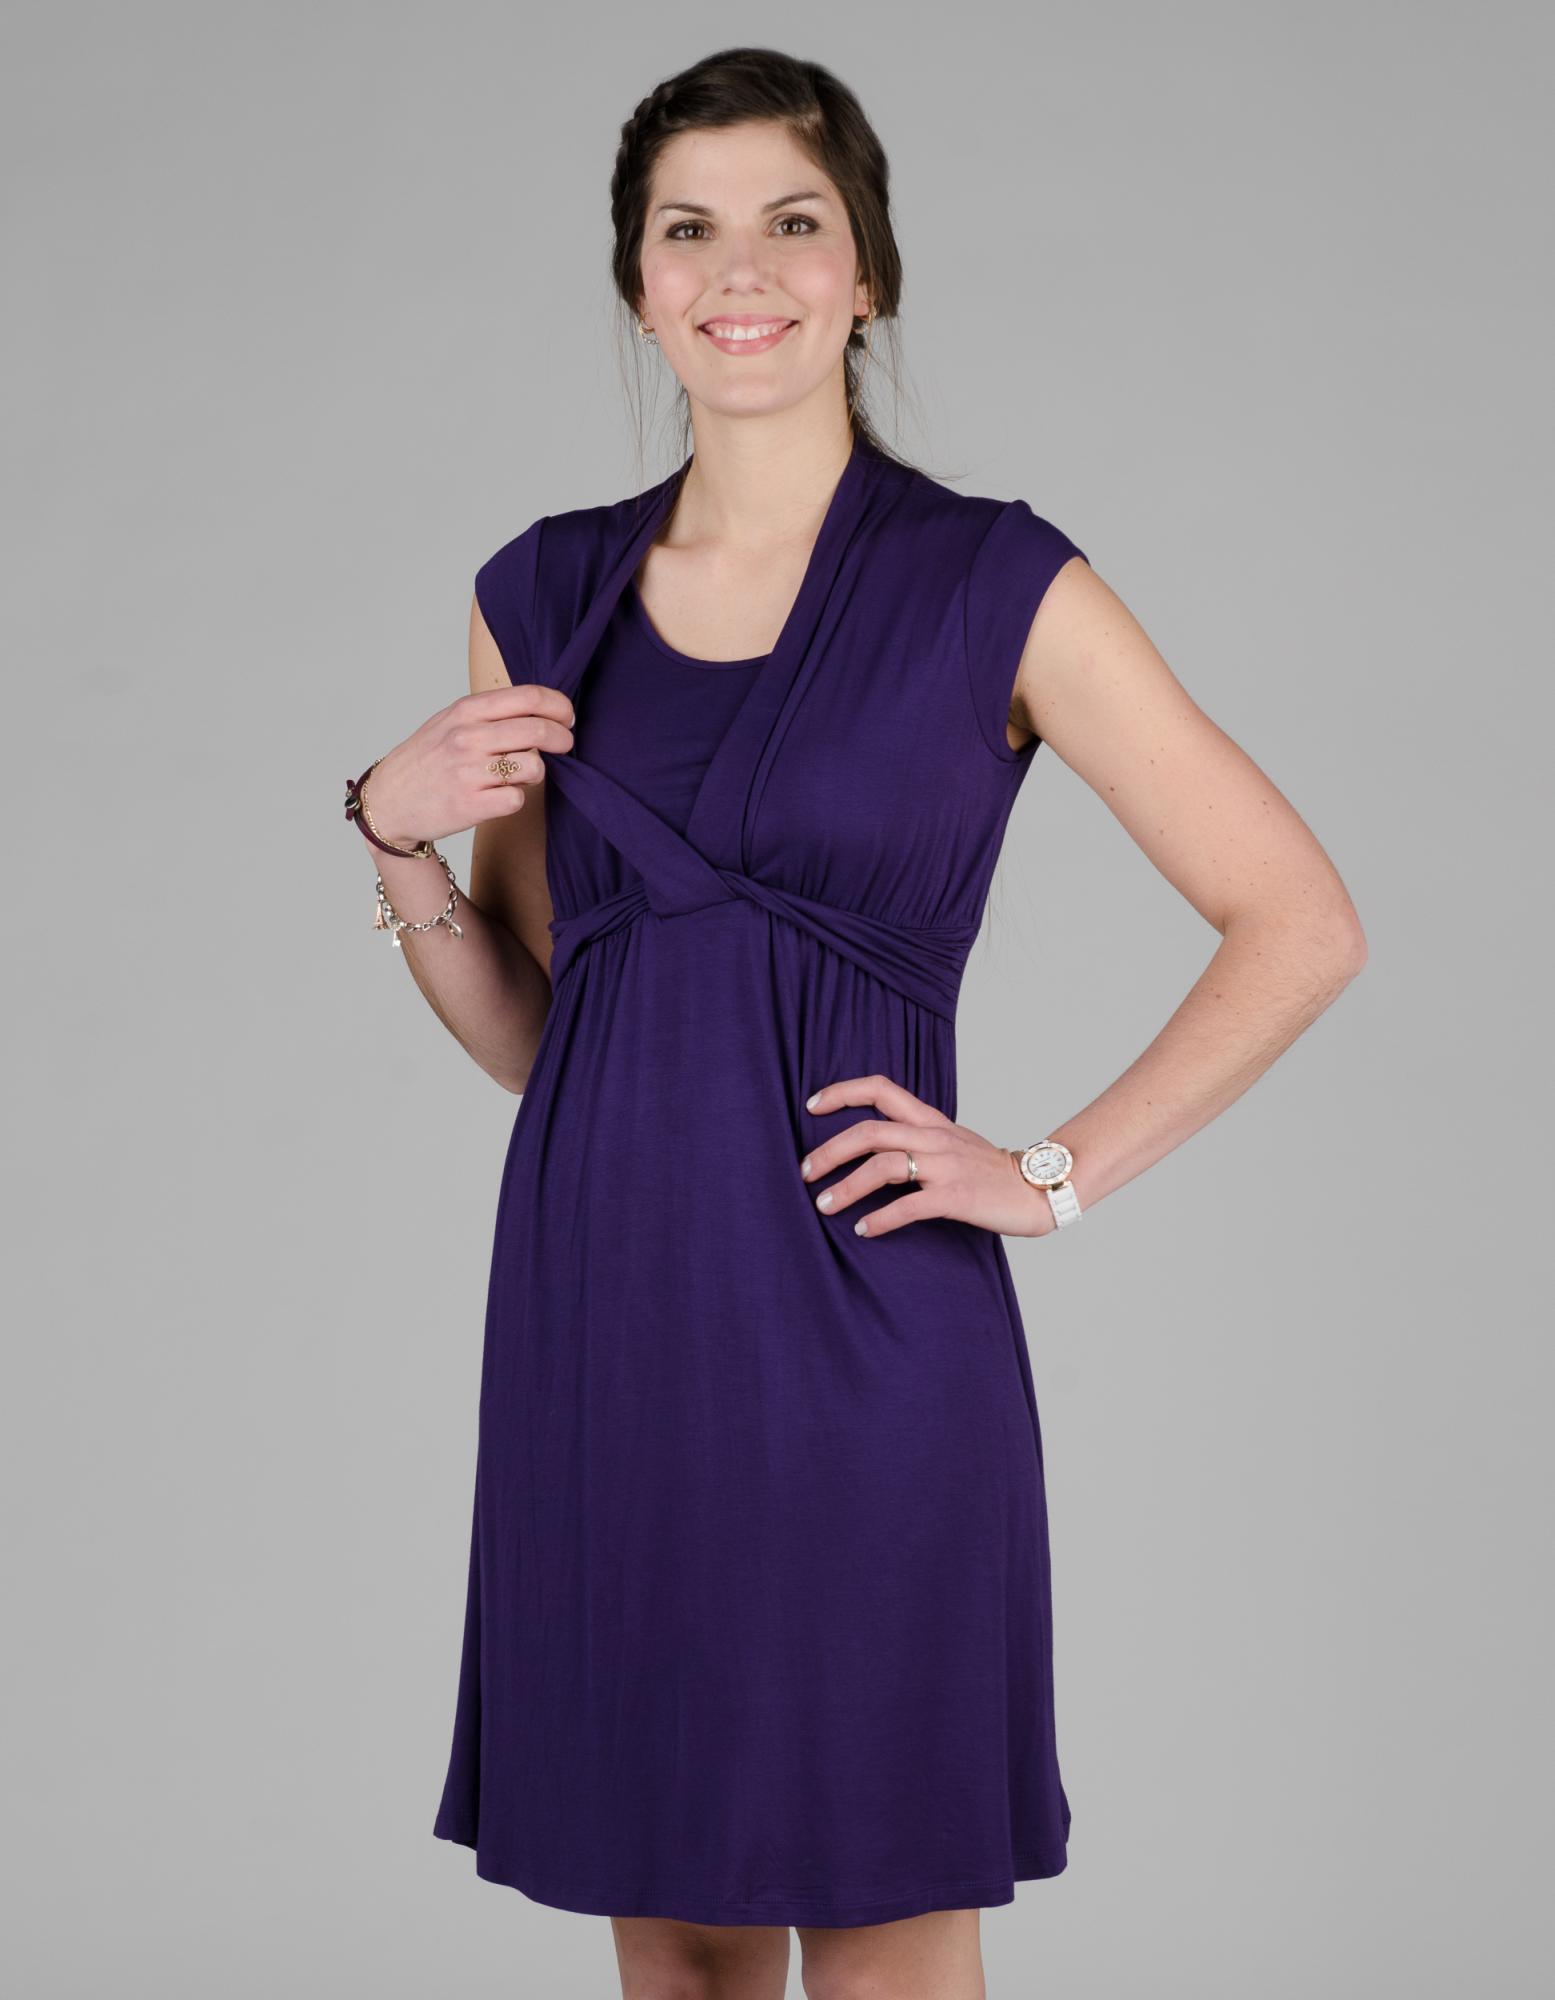 momzelle-suzy-nursing-dress-purple-opening.jpg